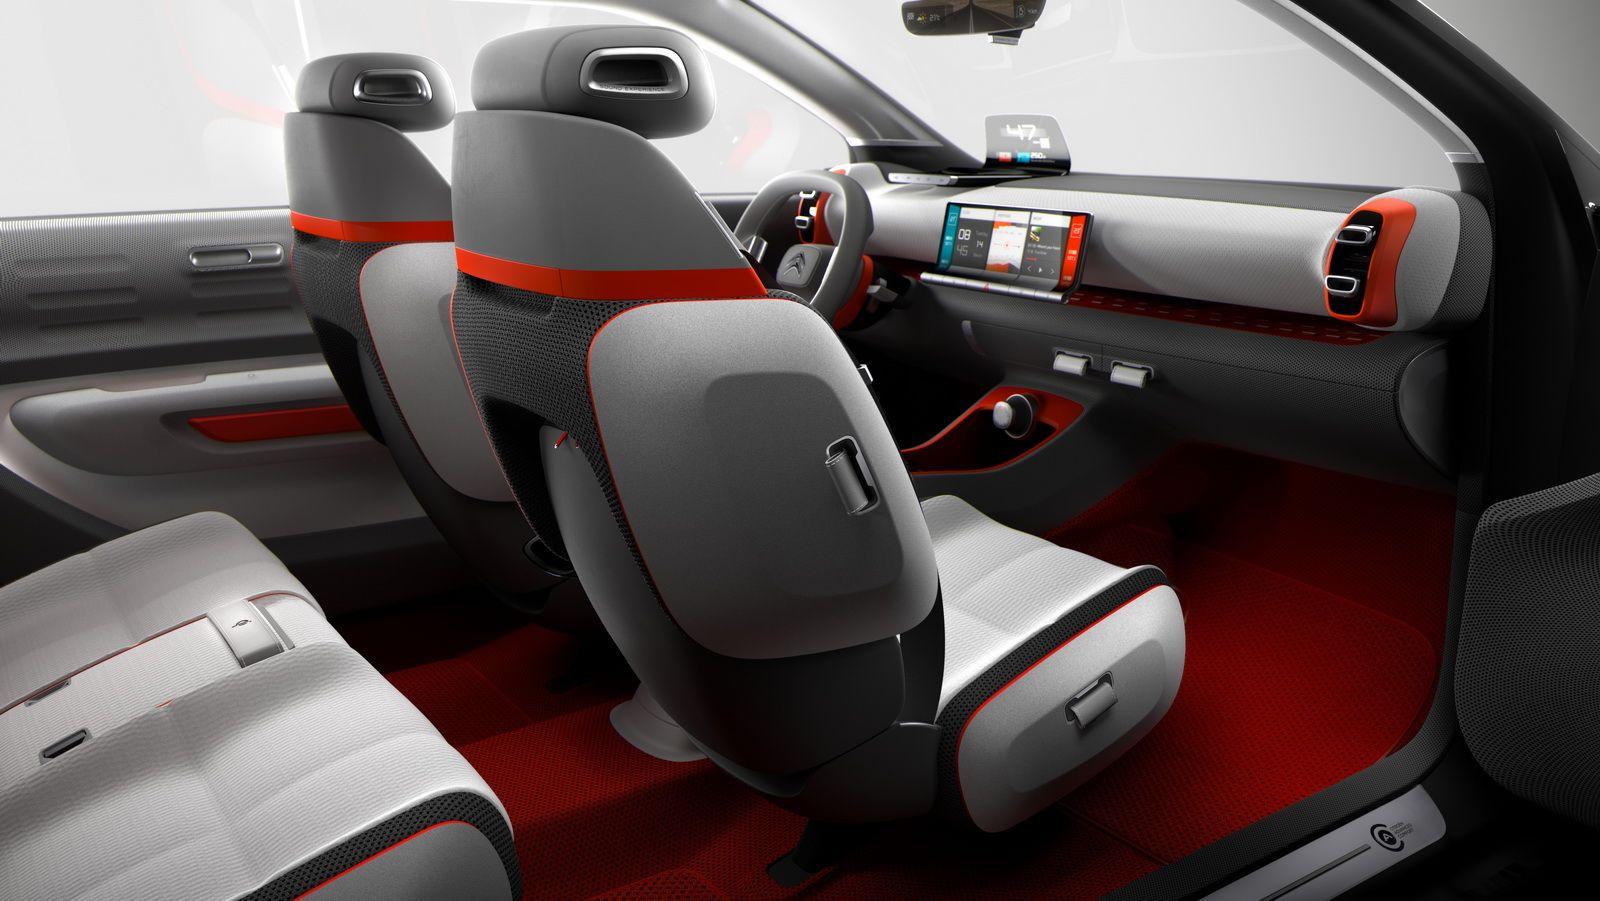 Citroen C-Aircross Concept Previews Next-Gen C3 Picasso ...